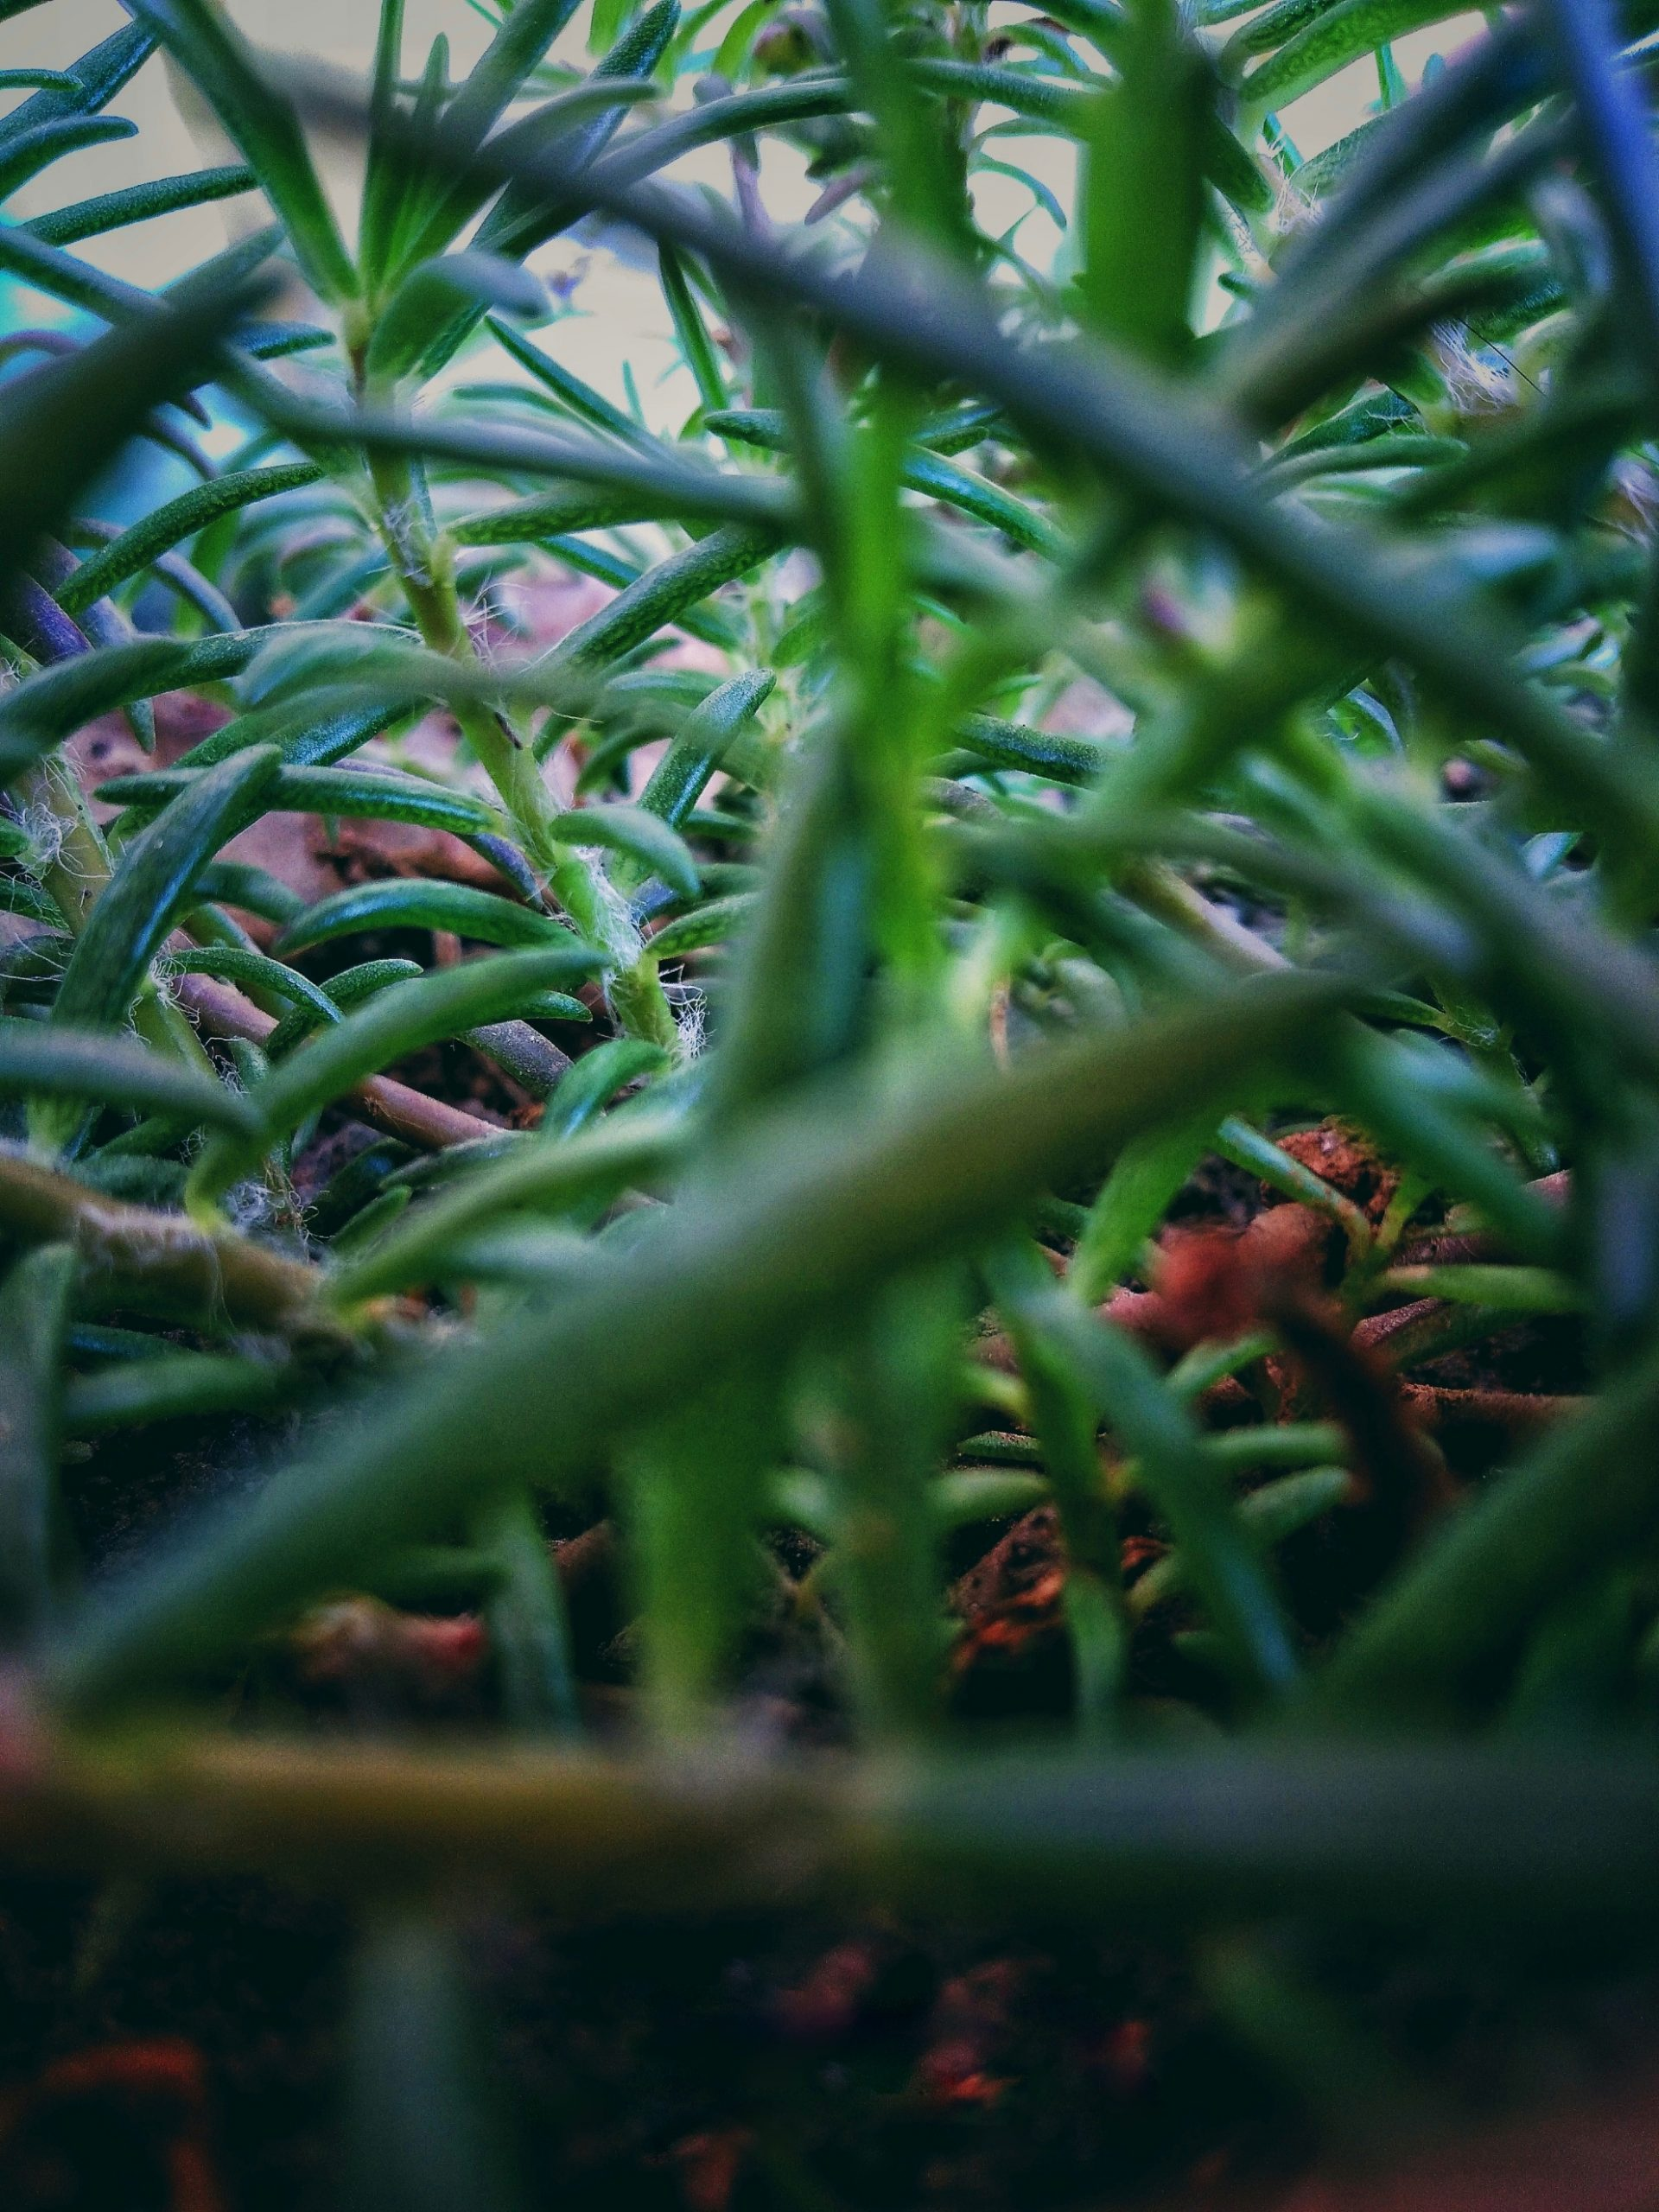 Under the grass